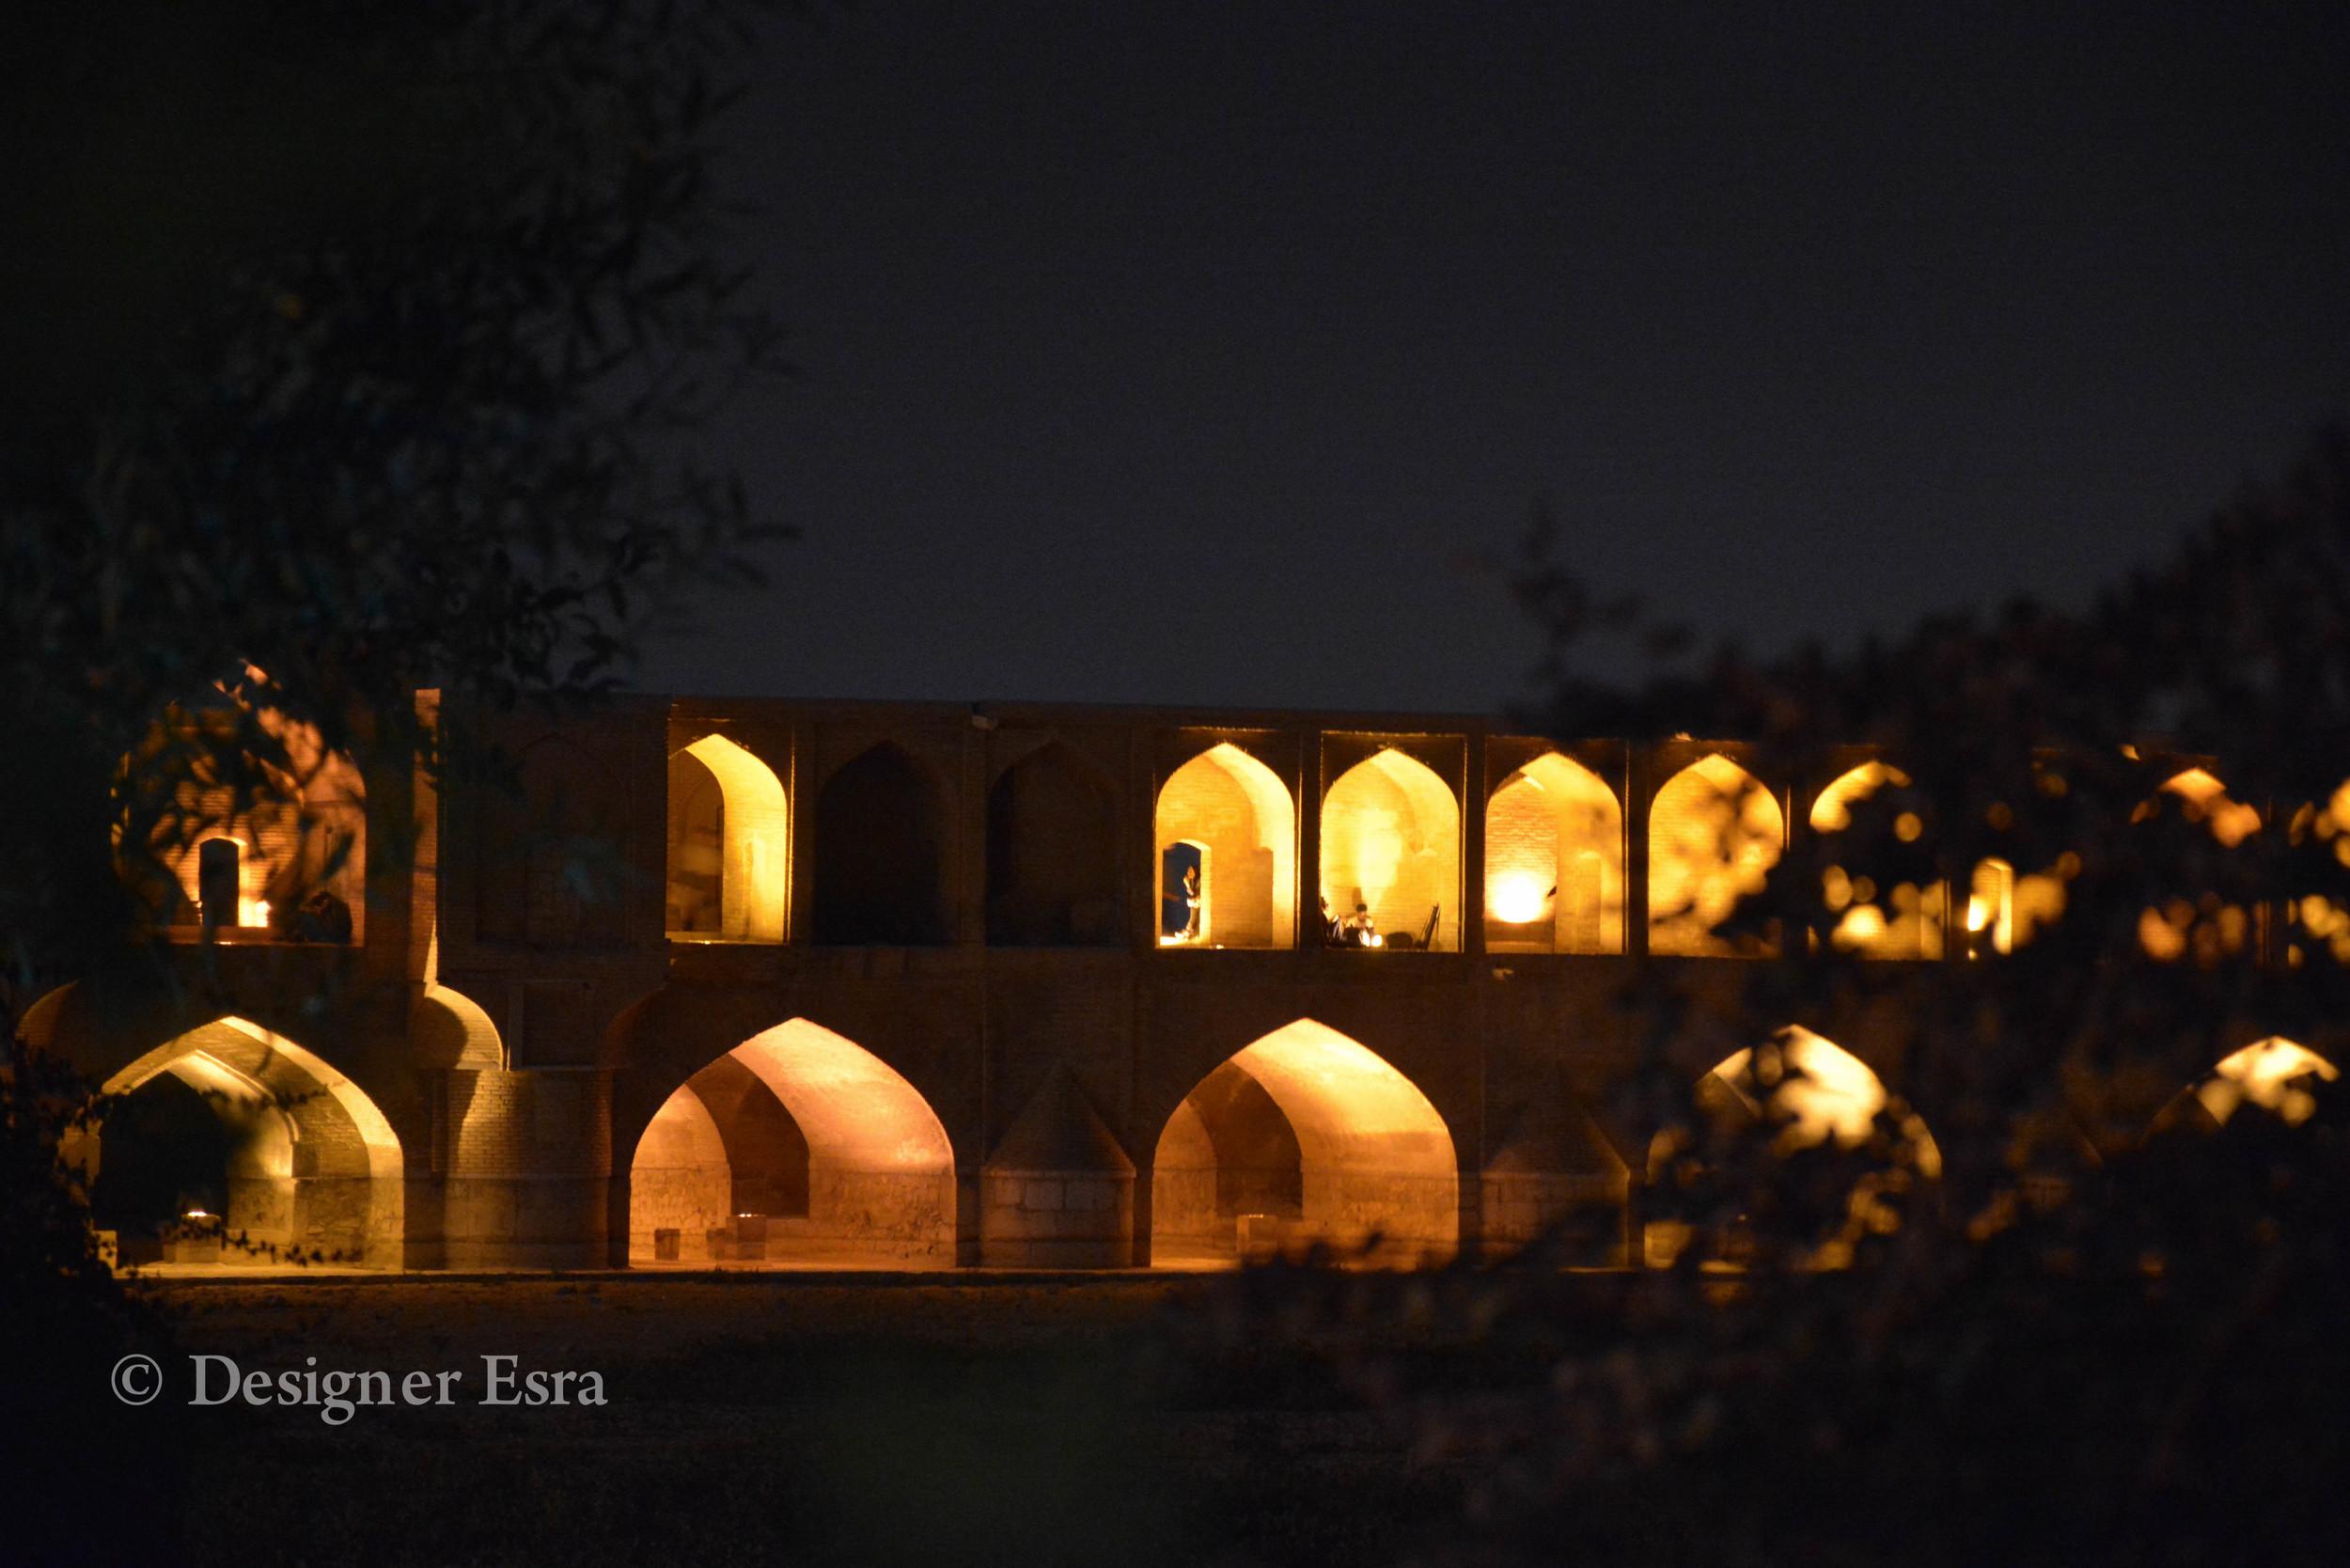 Lover's Bridge in Esfahan